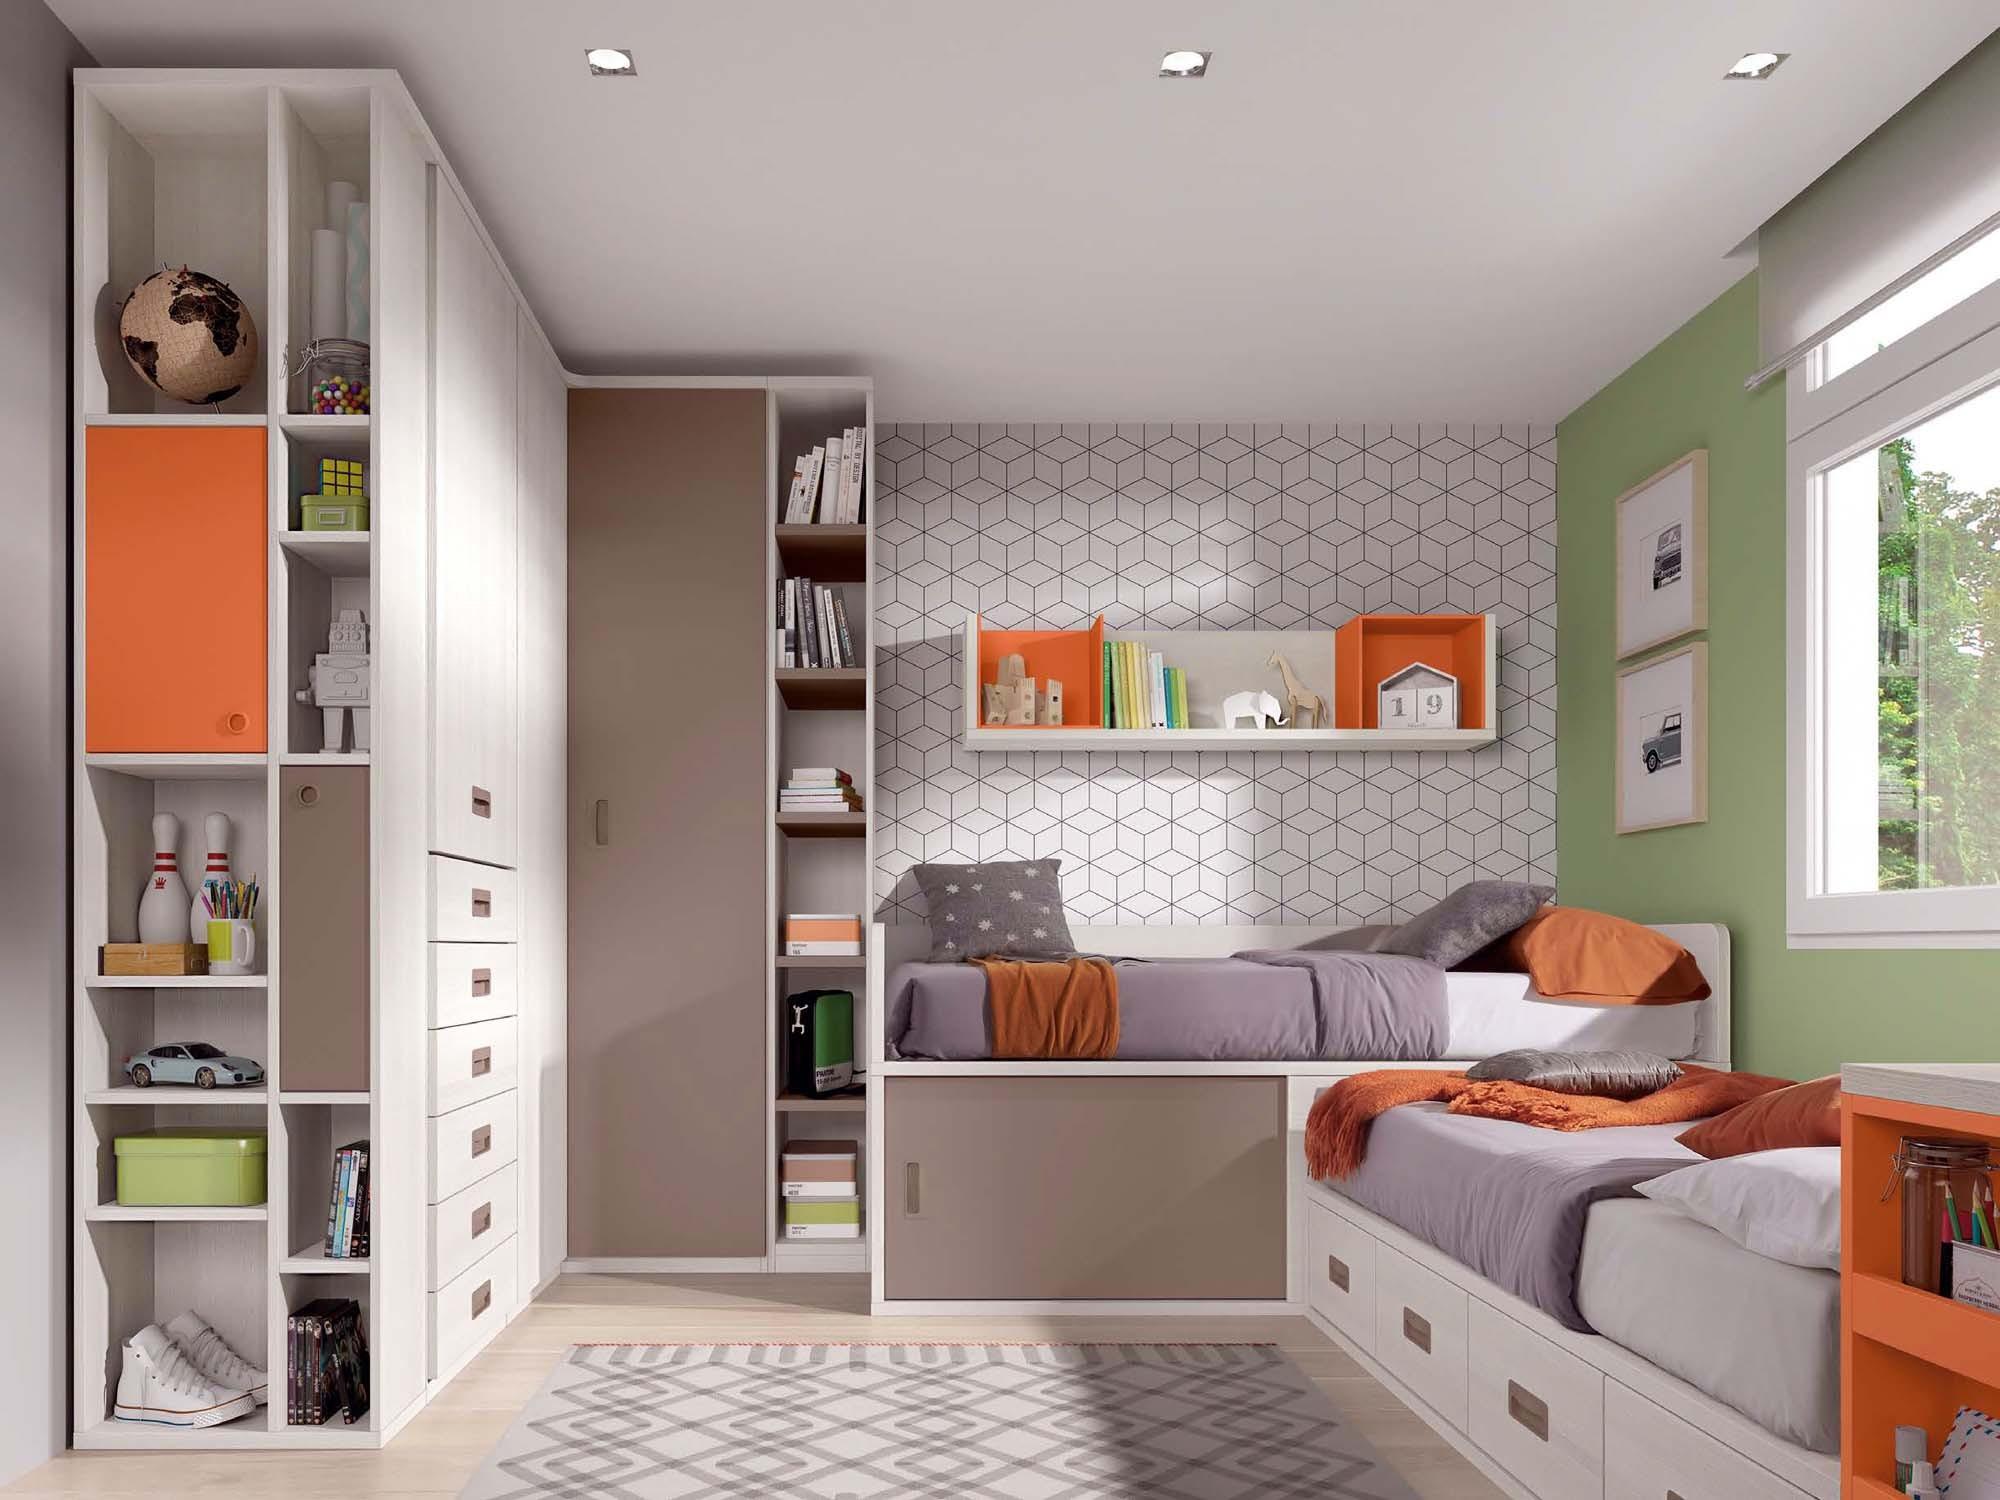 lits jumeaux d 39 angle avec rangements glicerio so nuit. Black Bedroom Furniture Sets. Home Design Ideas